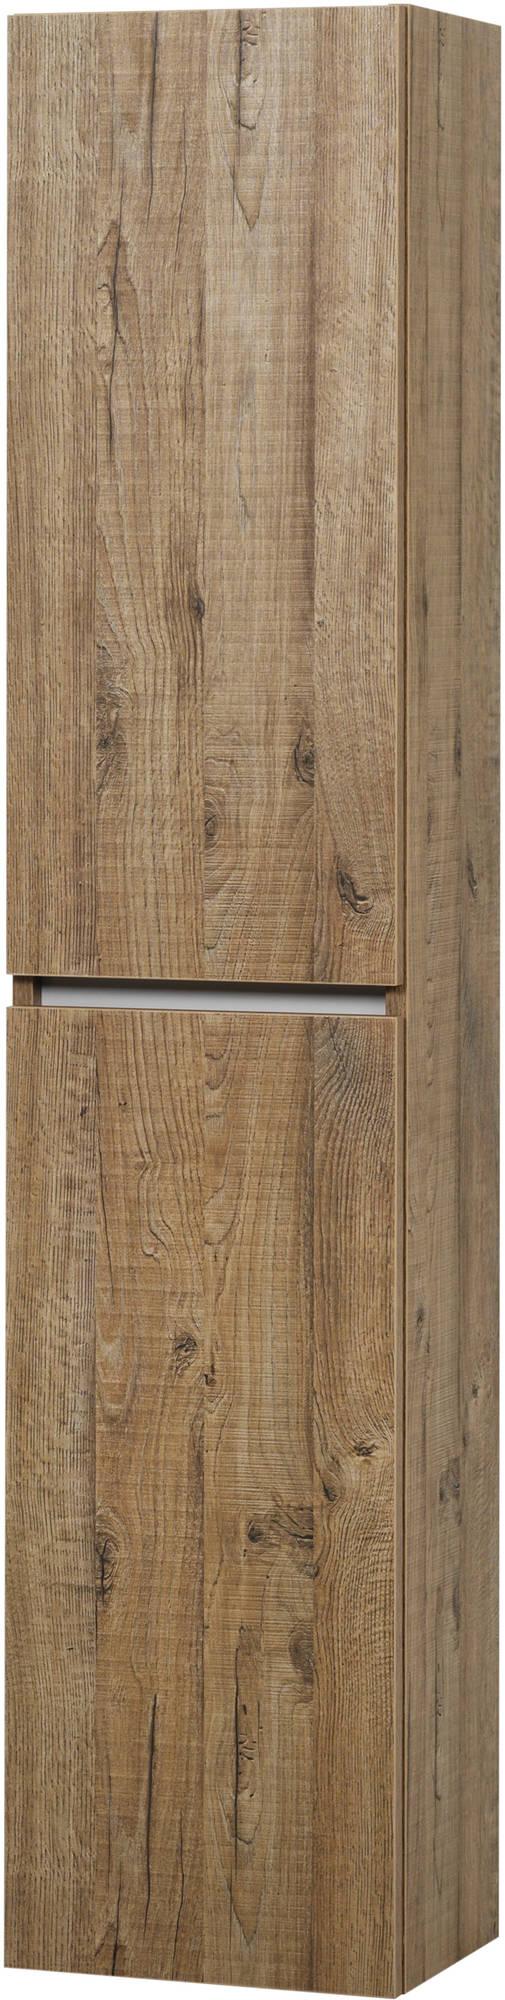 Ben Limara Hoge kast links 35x29x165 cm Sherwood/Aluminium